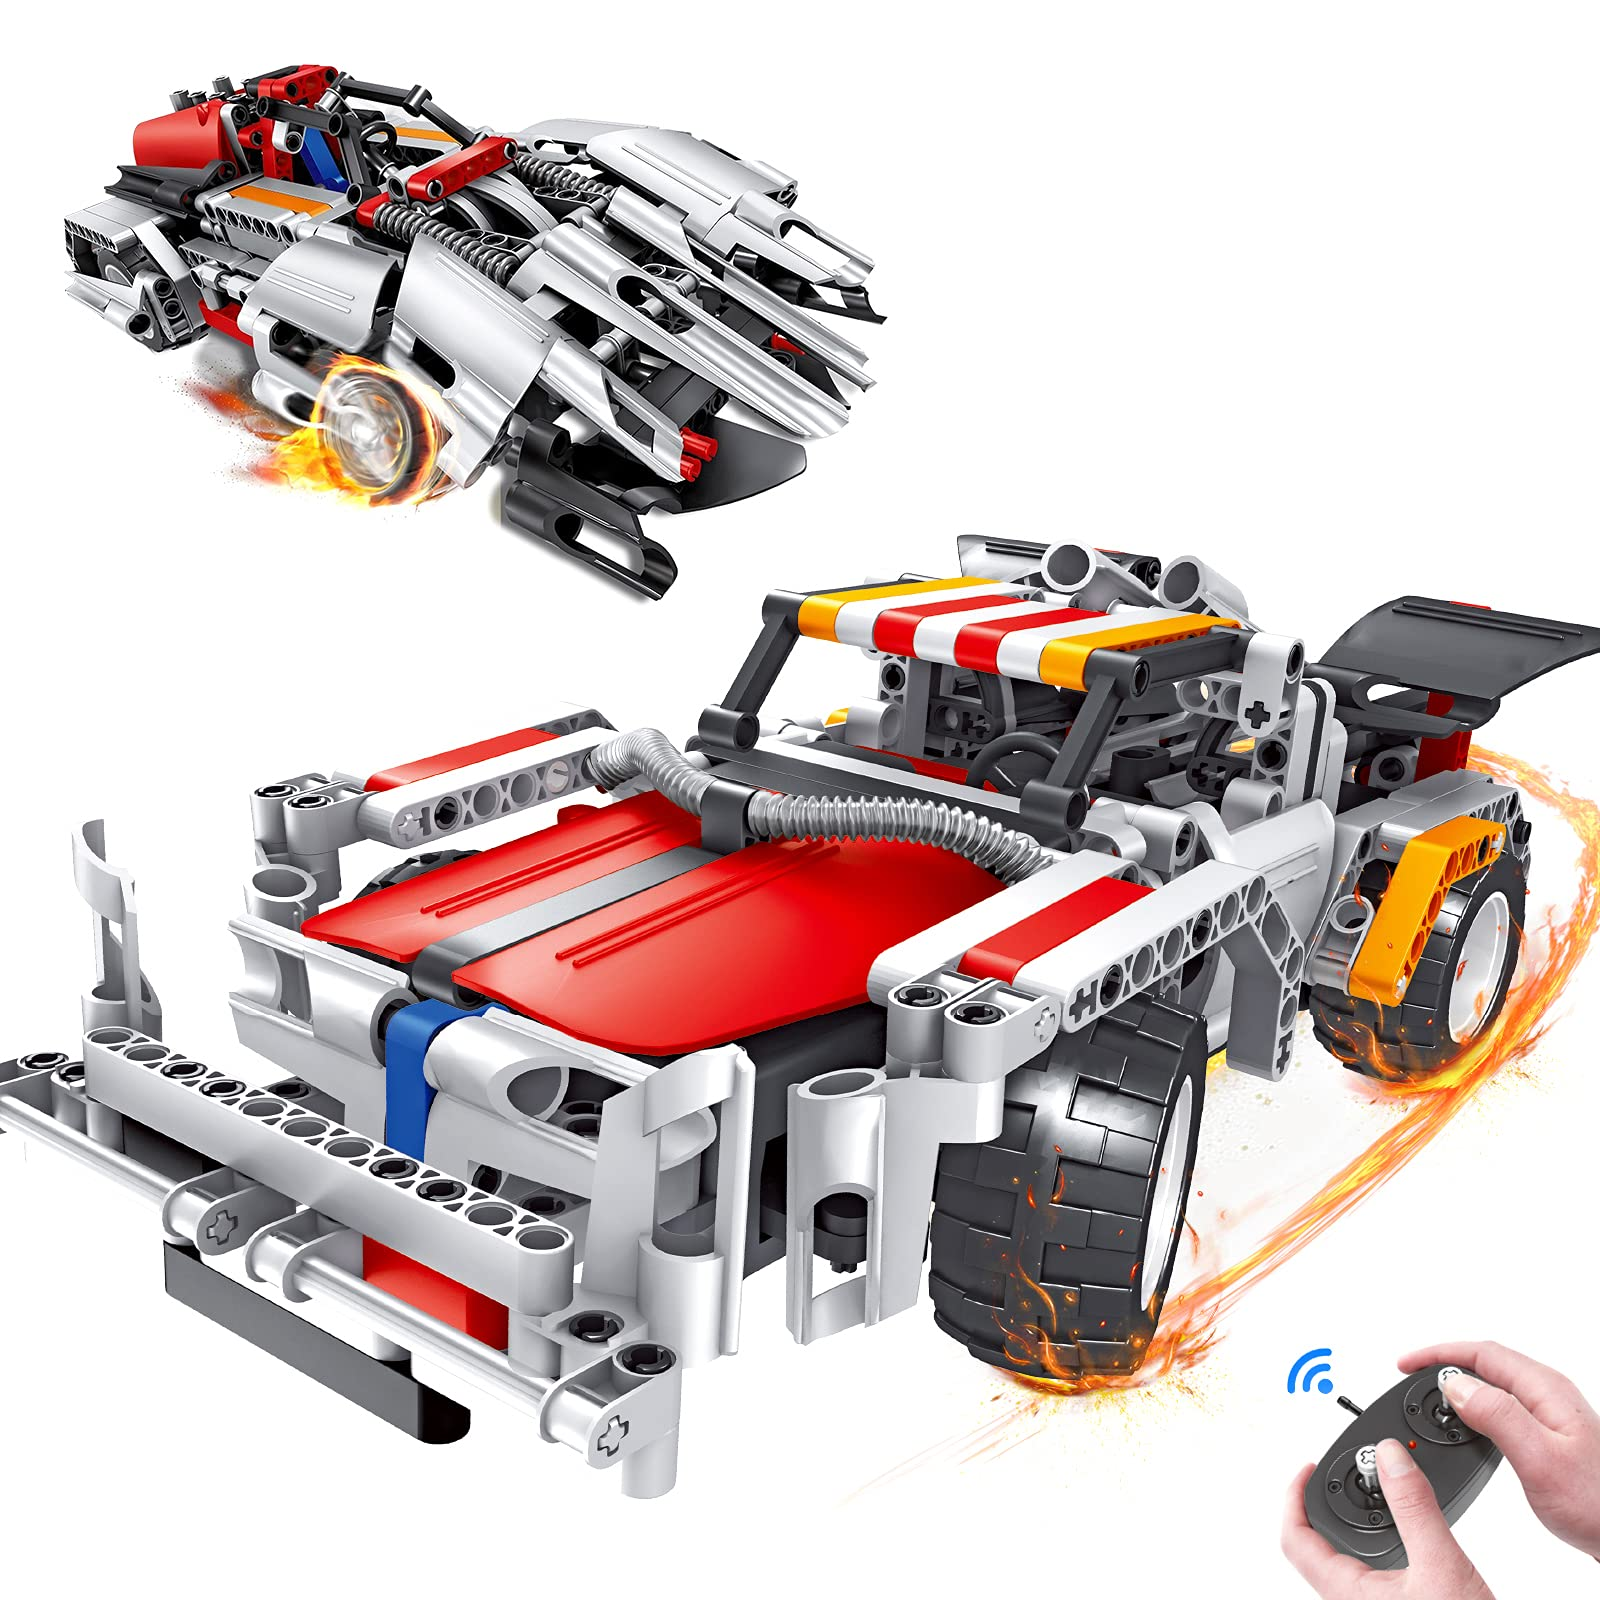 morwant STEM Remote Control Building Ages 6-12, 2-in-1 Racing Car Models (326pcs)